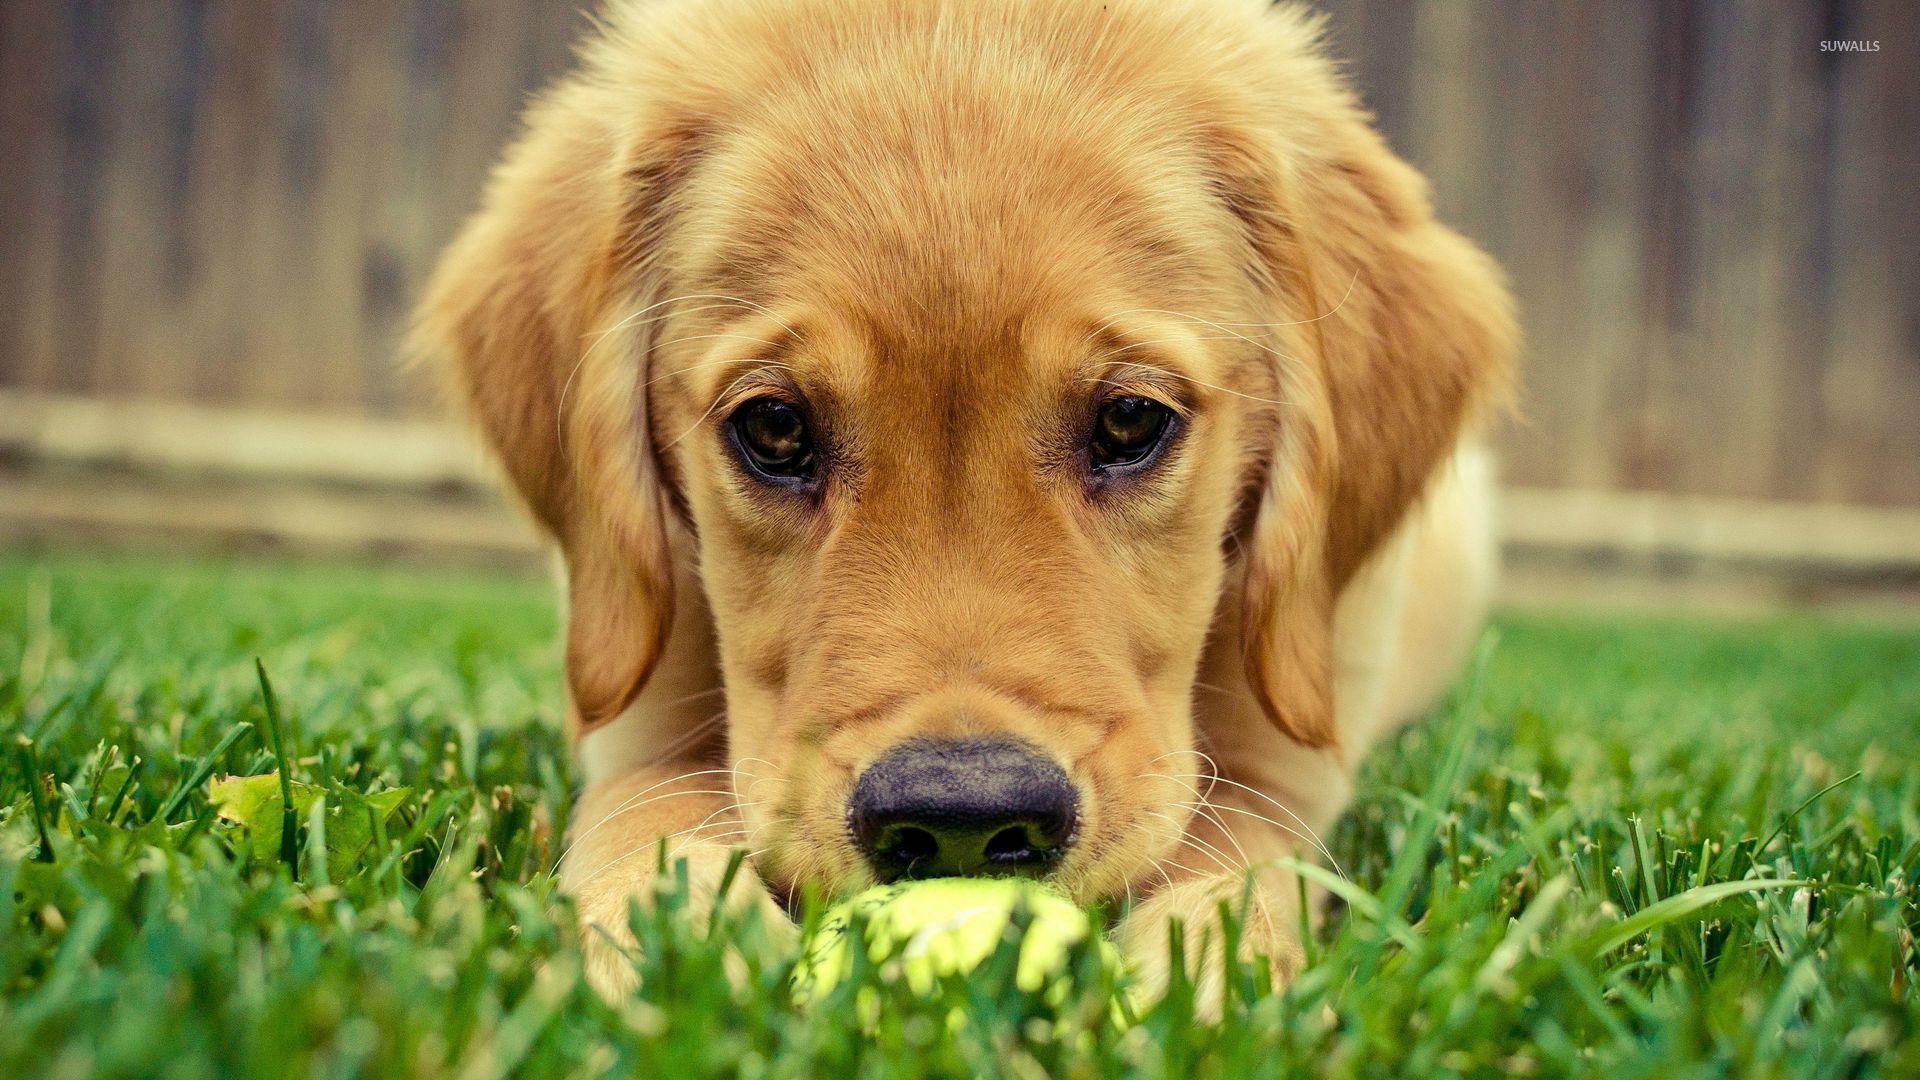 Golden Retriever Puppy 3 Wallpaper Animal Wallpapers 26778